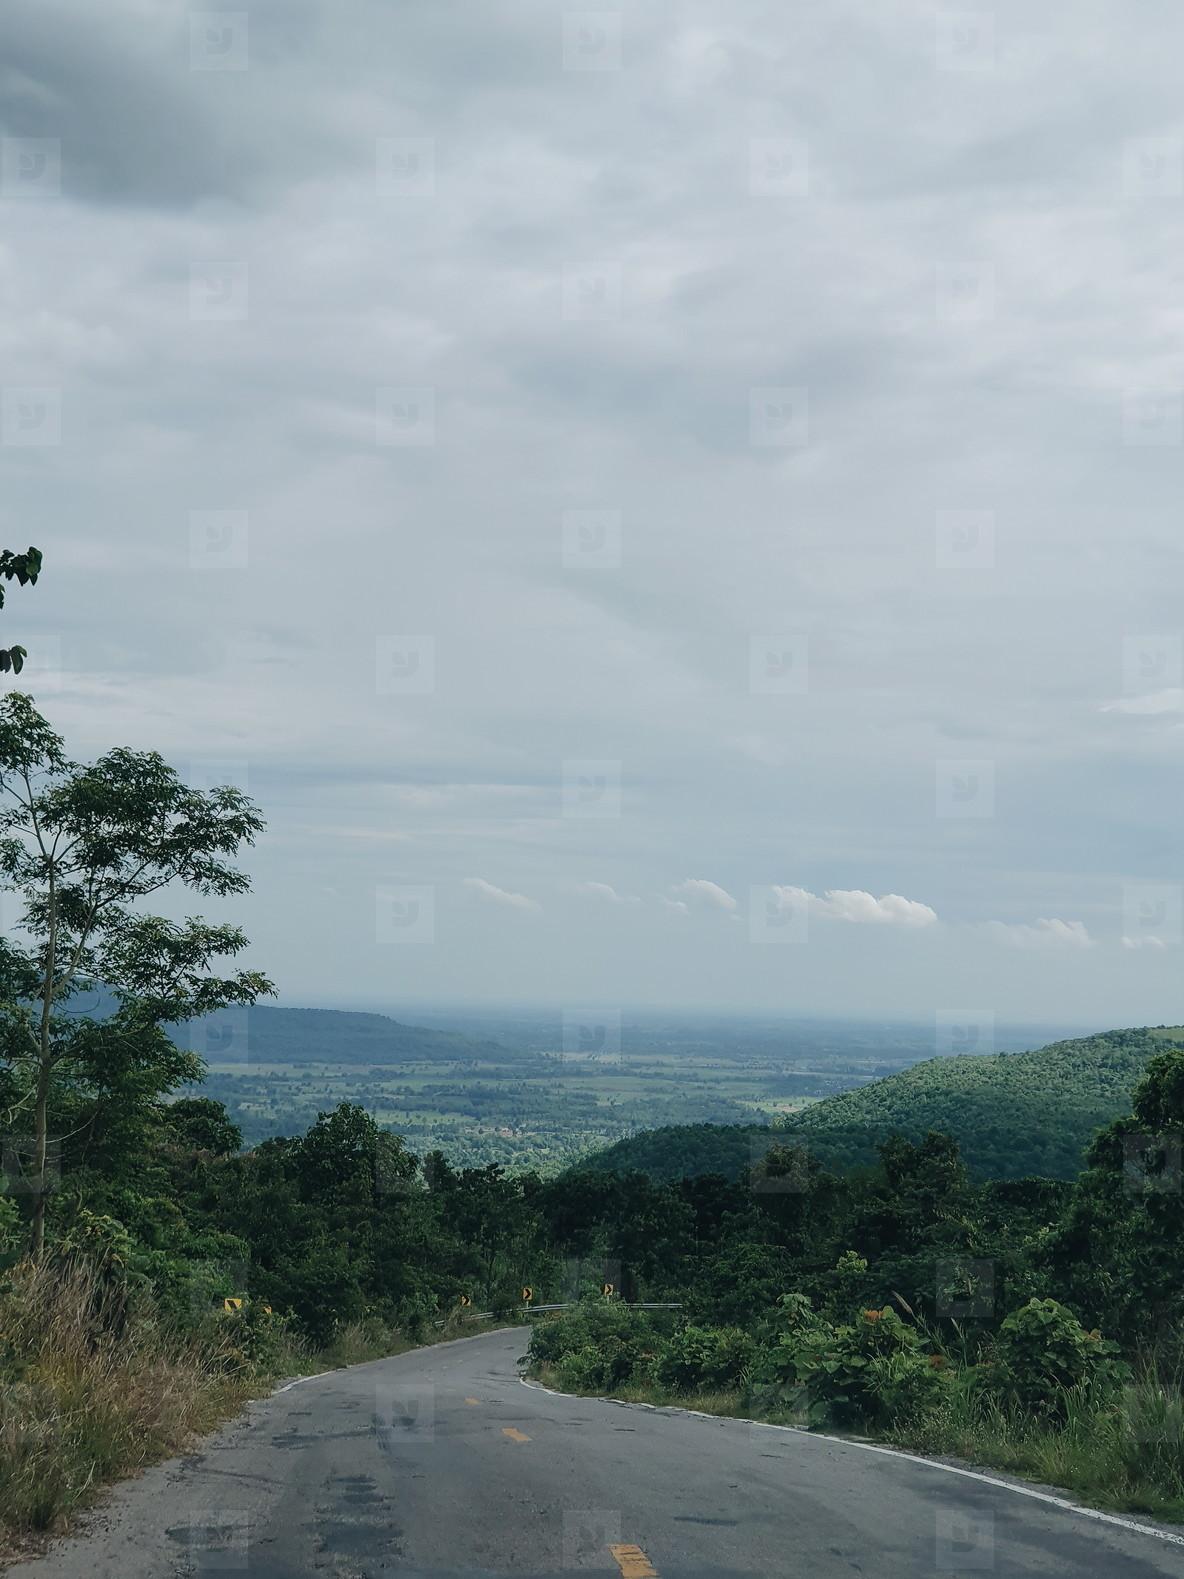 Asphalt road through the hill